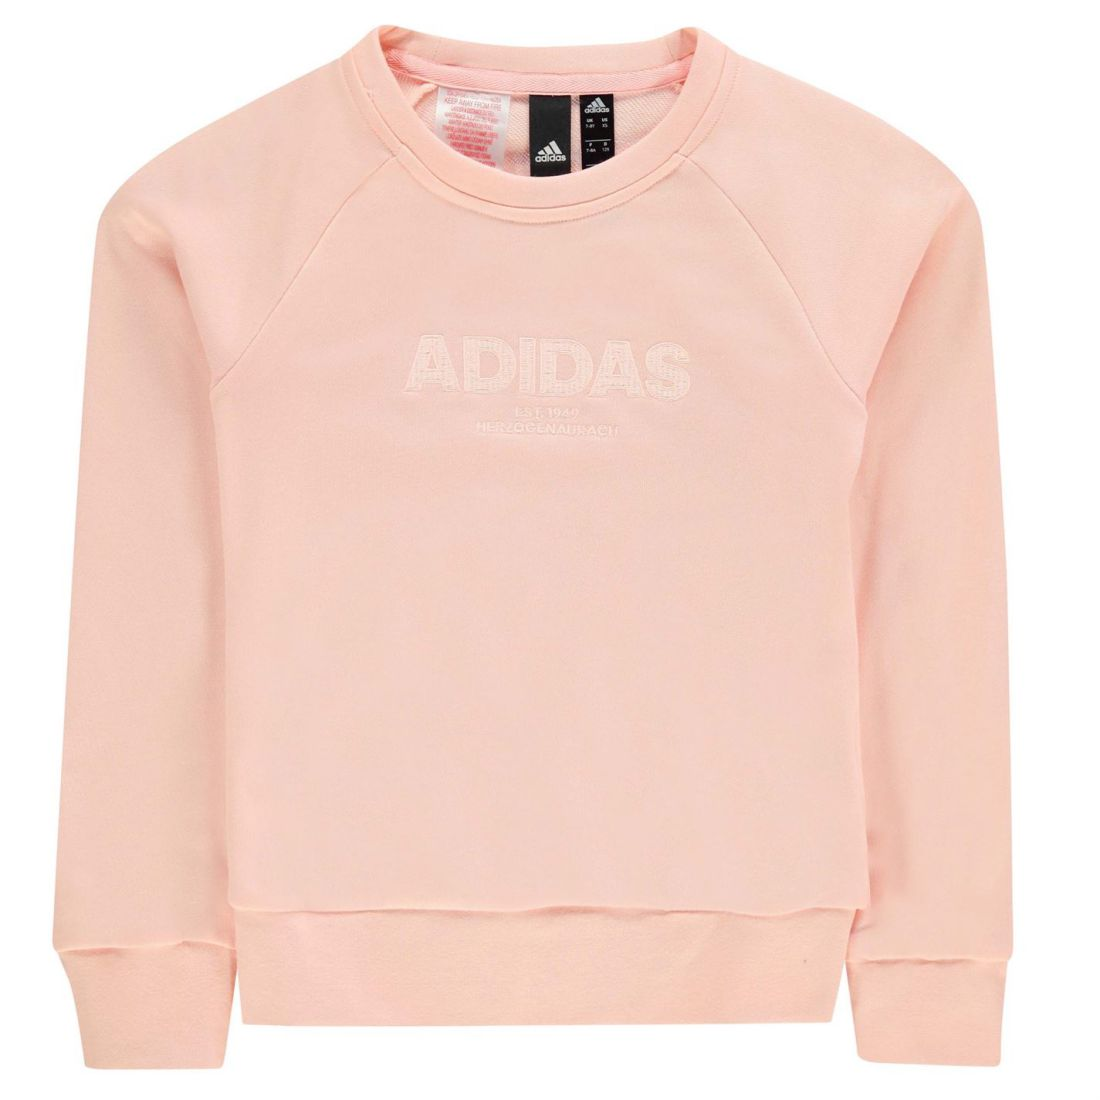 6fe811a27 adidas Kids Girls ESS AC Crw Sw JG83 Crew Sweater Jumper Pullover